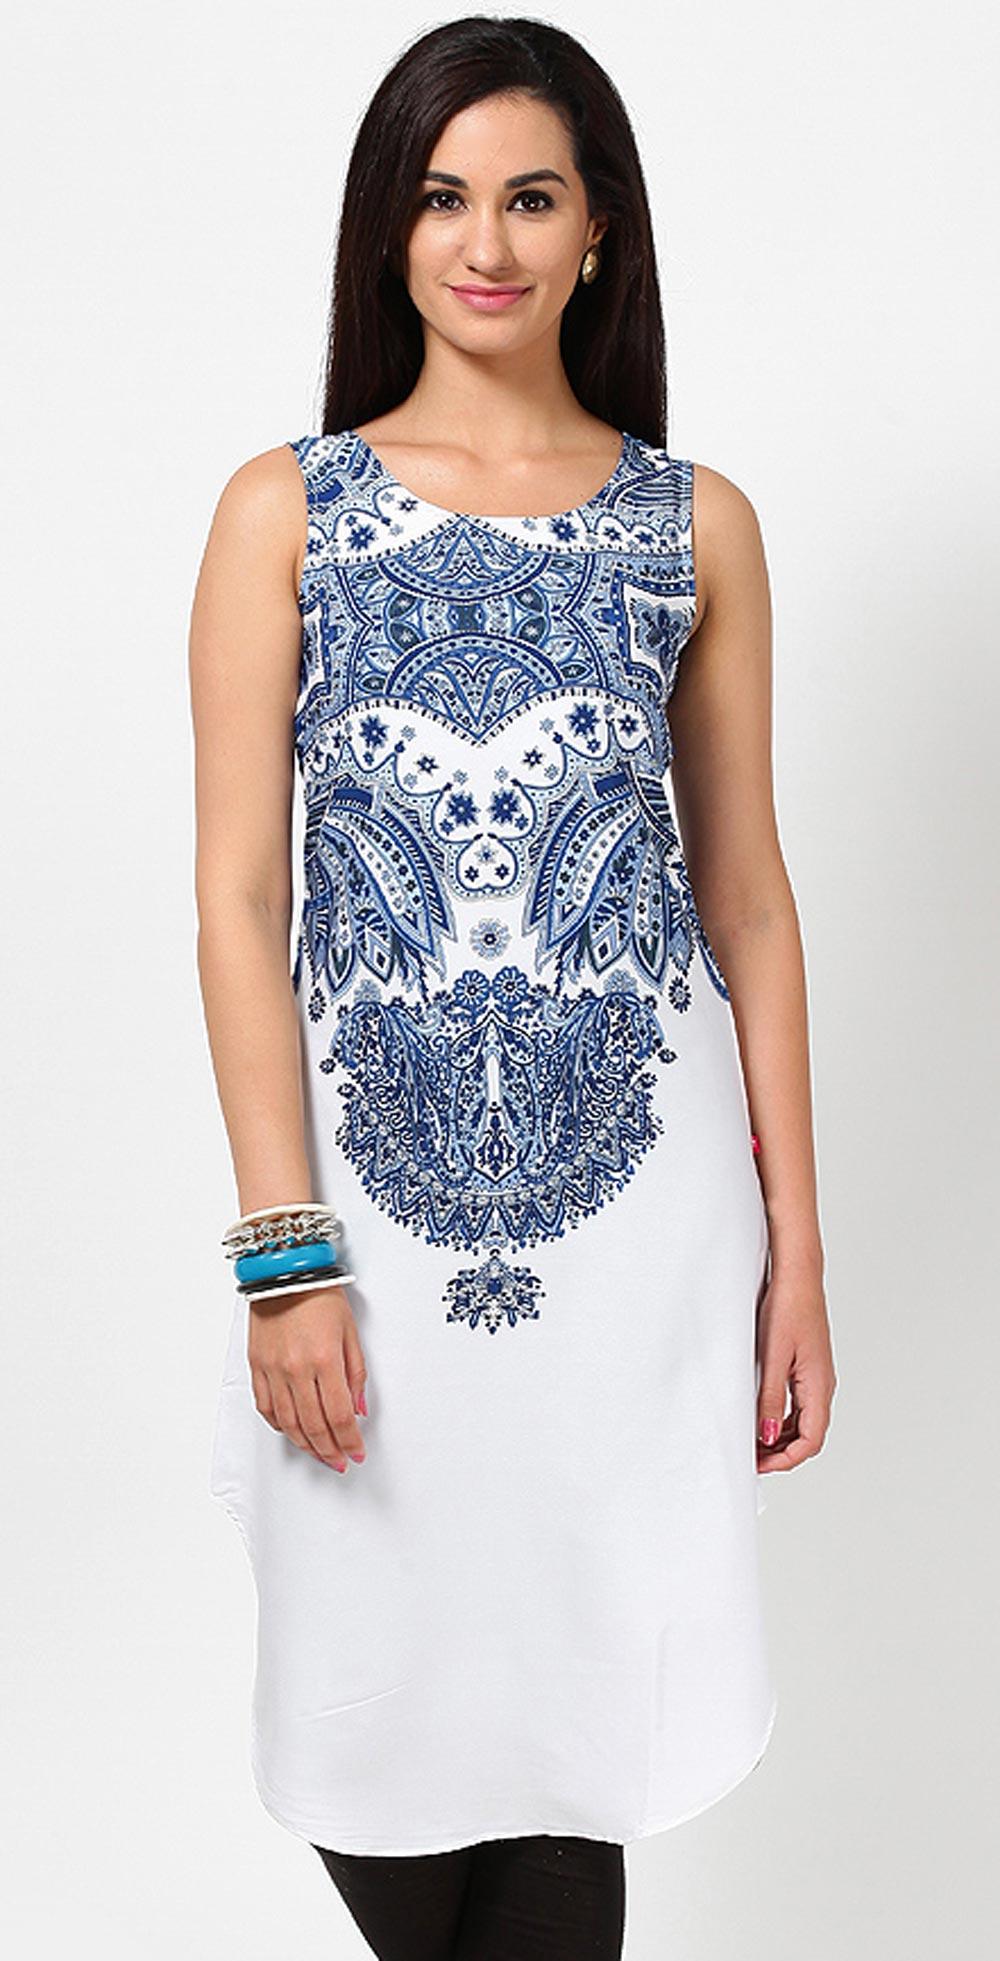 Shirt design kurti - Latest Women Cotton Shirts And Kurti Designs For Spring Summer 5